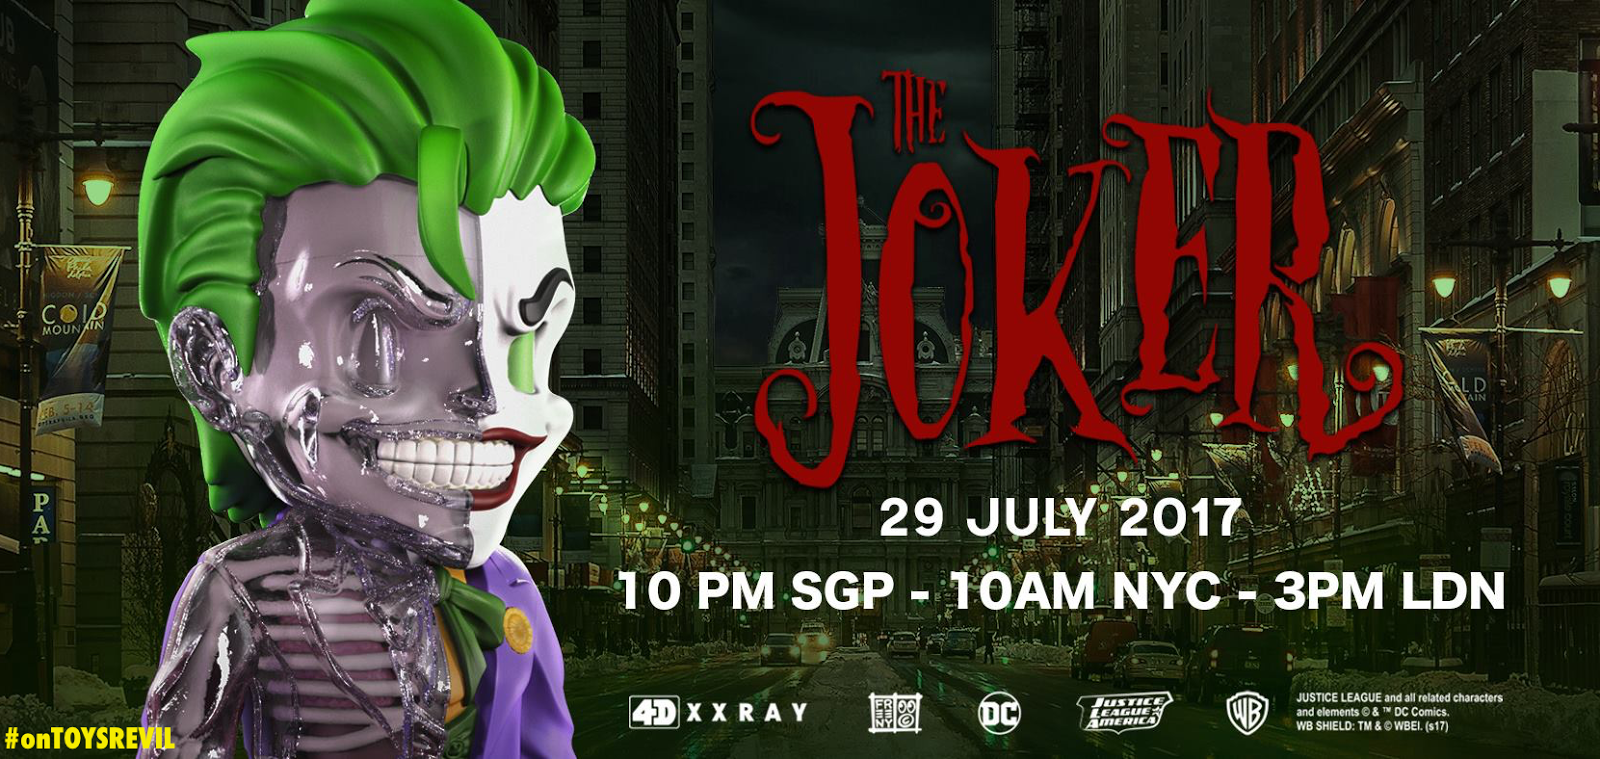 4D XXRAY THE JOKER by Jason Freeny x Mighty Jaxx for July 29th Pre ...